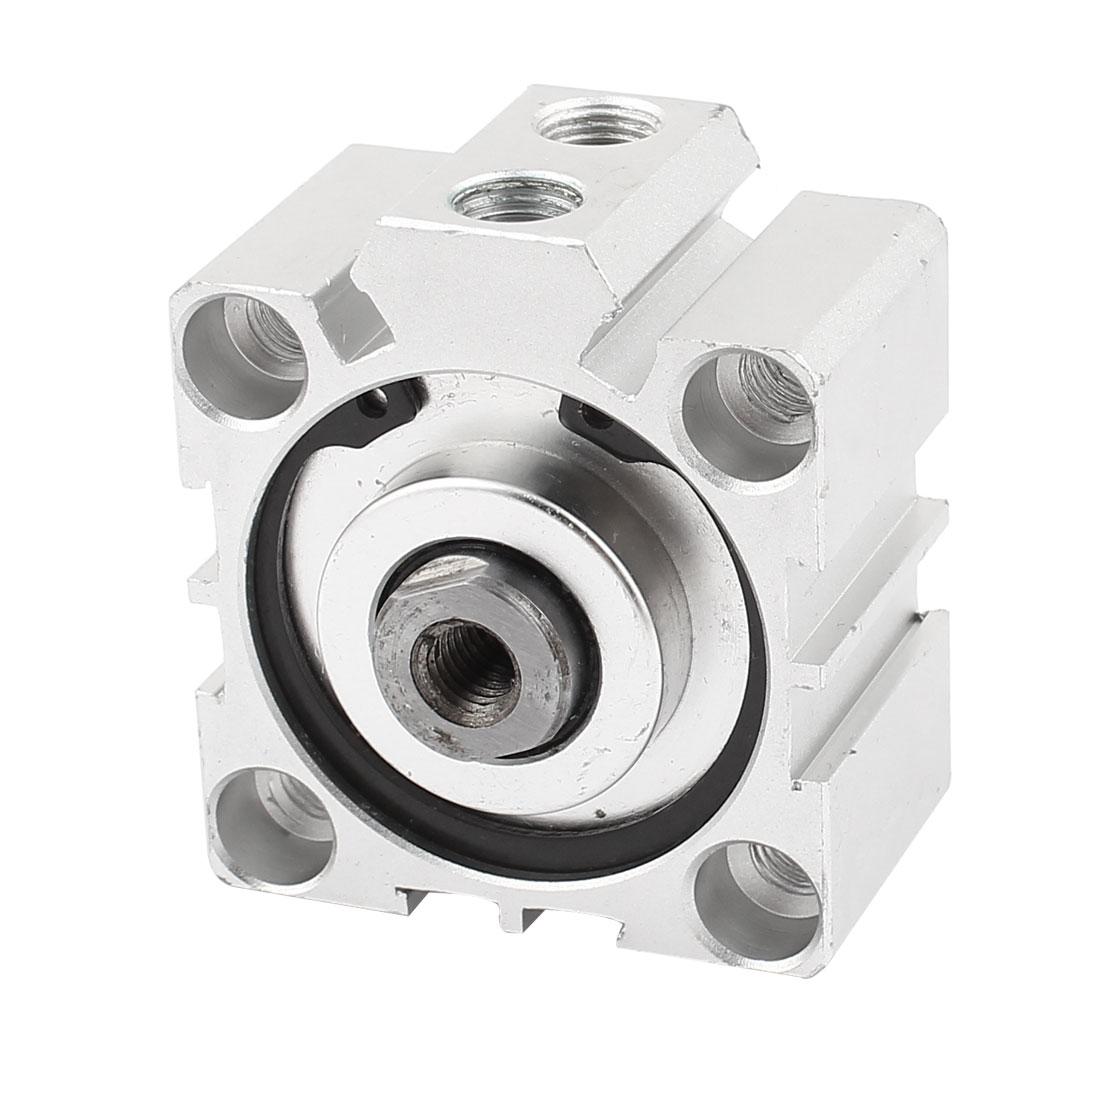 SDA40x5 40mm Bore 5mm Stroke Single Rod Aluminum Alloy Pneumatic Air Cylinder